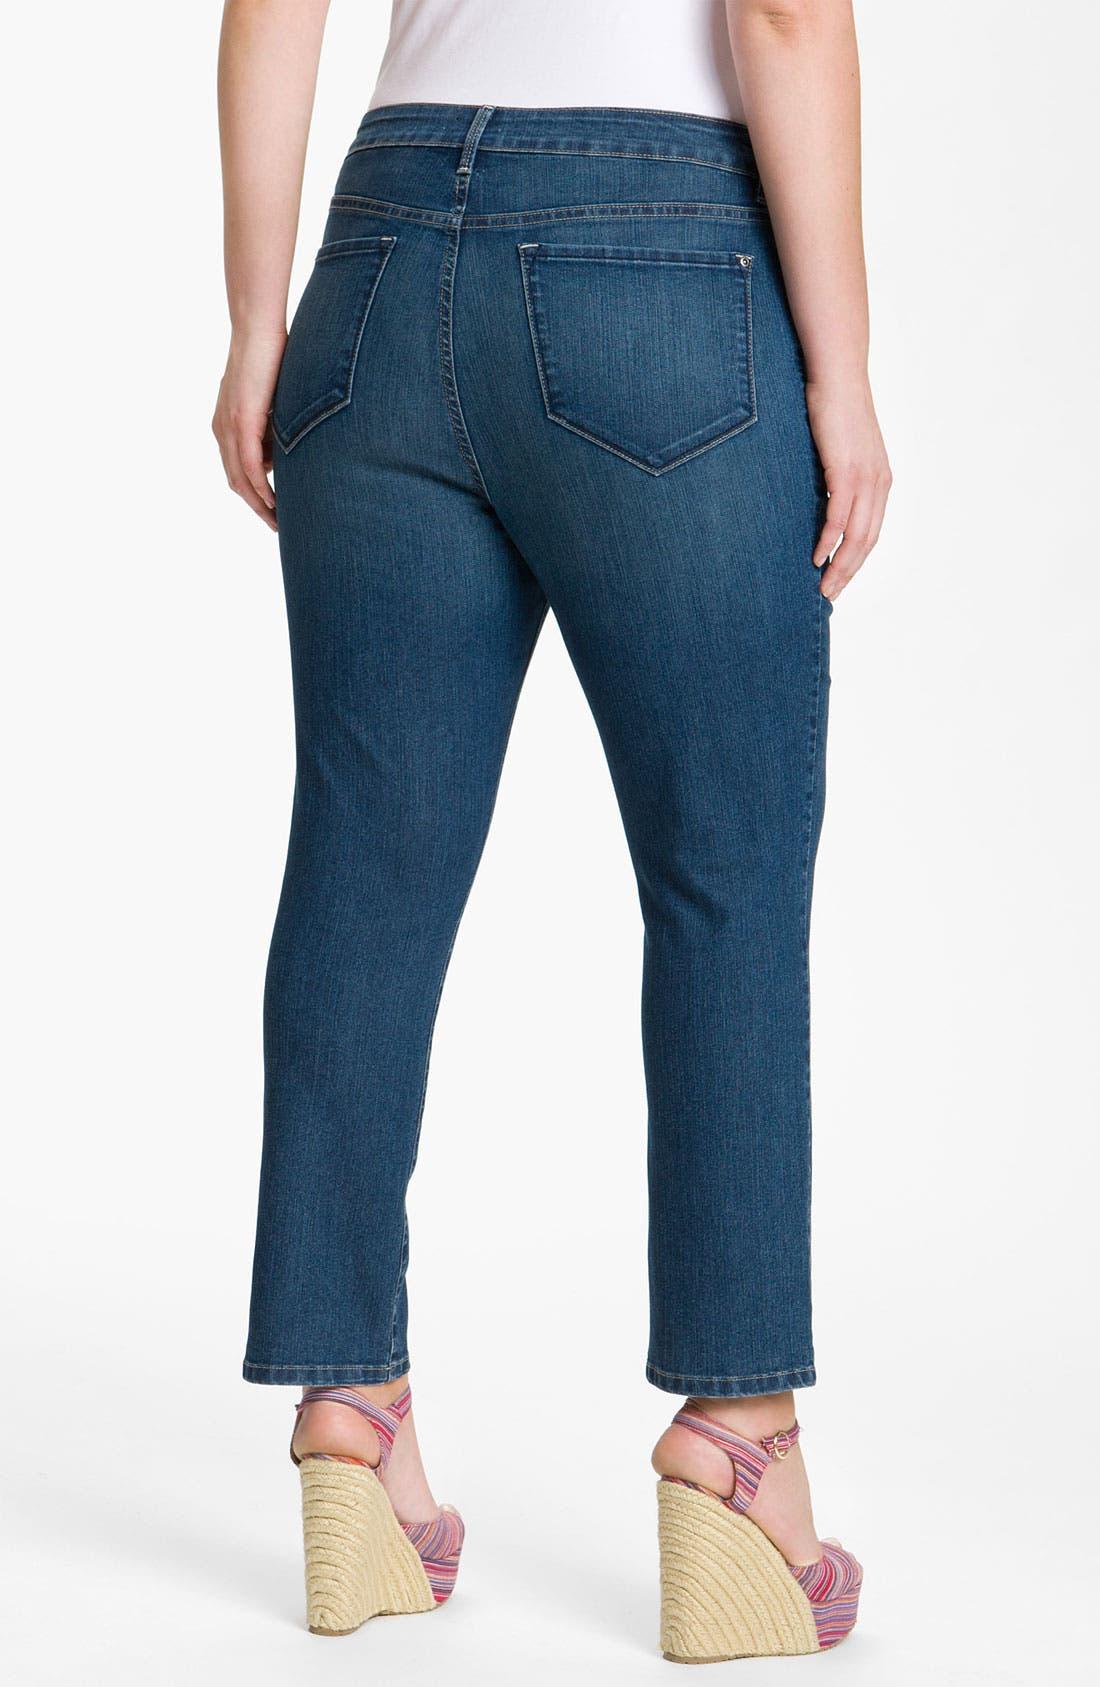 Alternate Image 1 Selected - NYDJ 'Cora' Ankle Jeans (Plus)